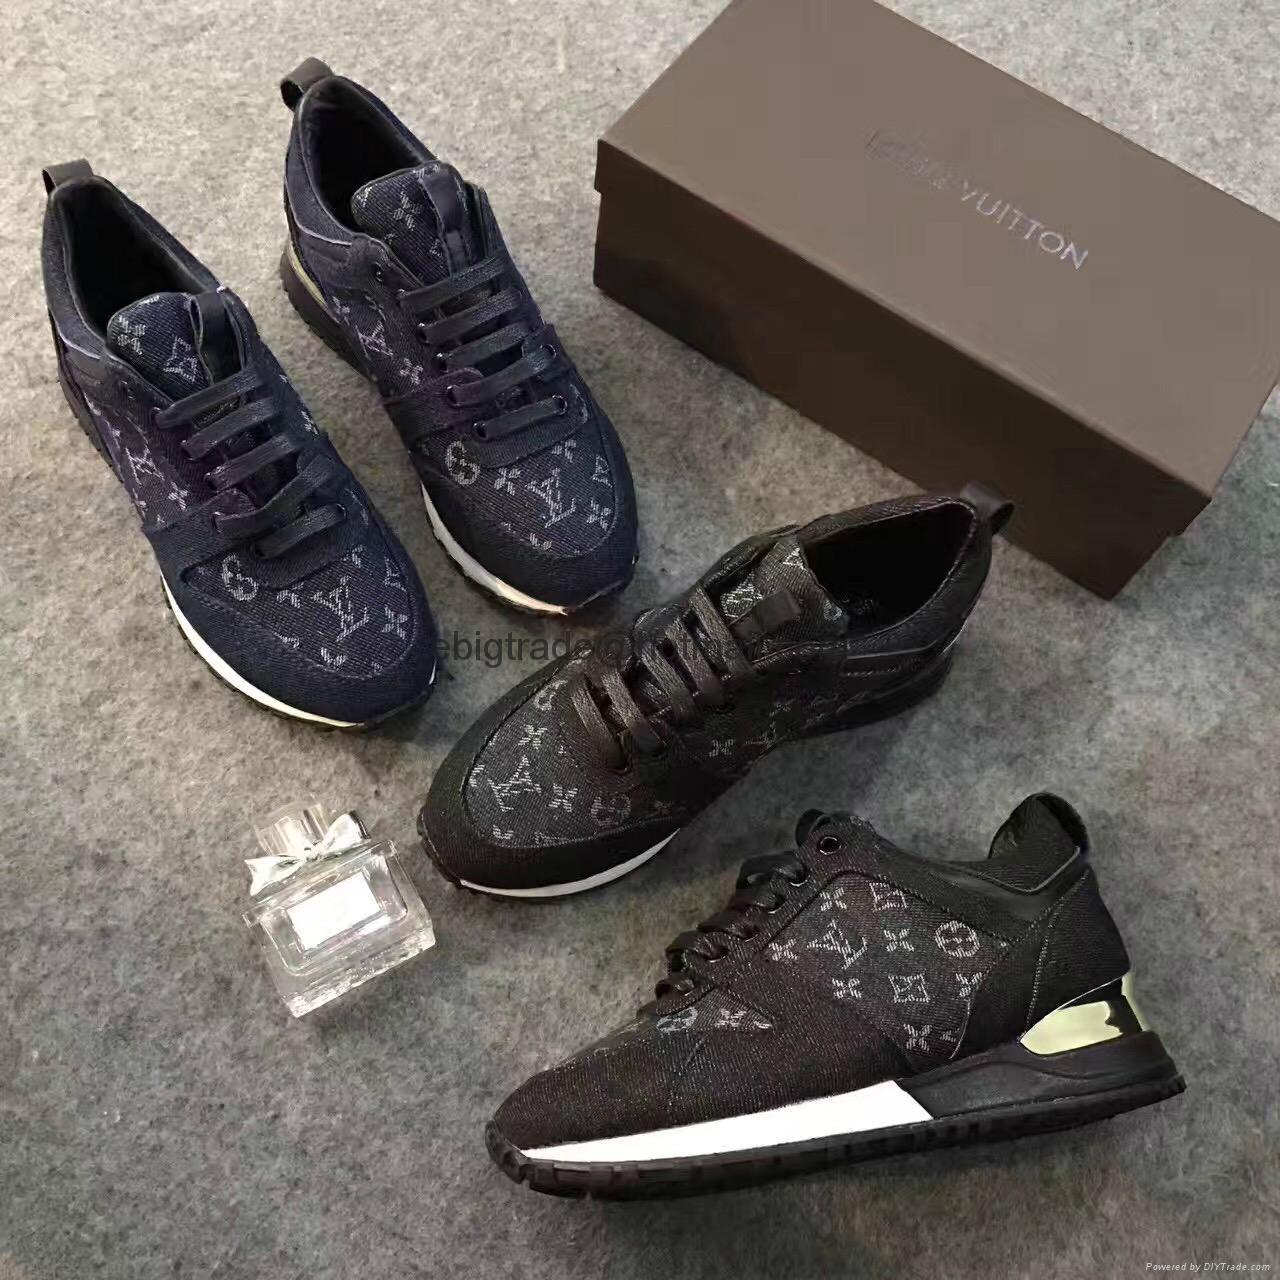 LOUIS VUITTON shoes for women